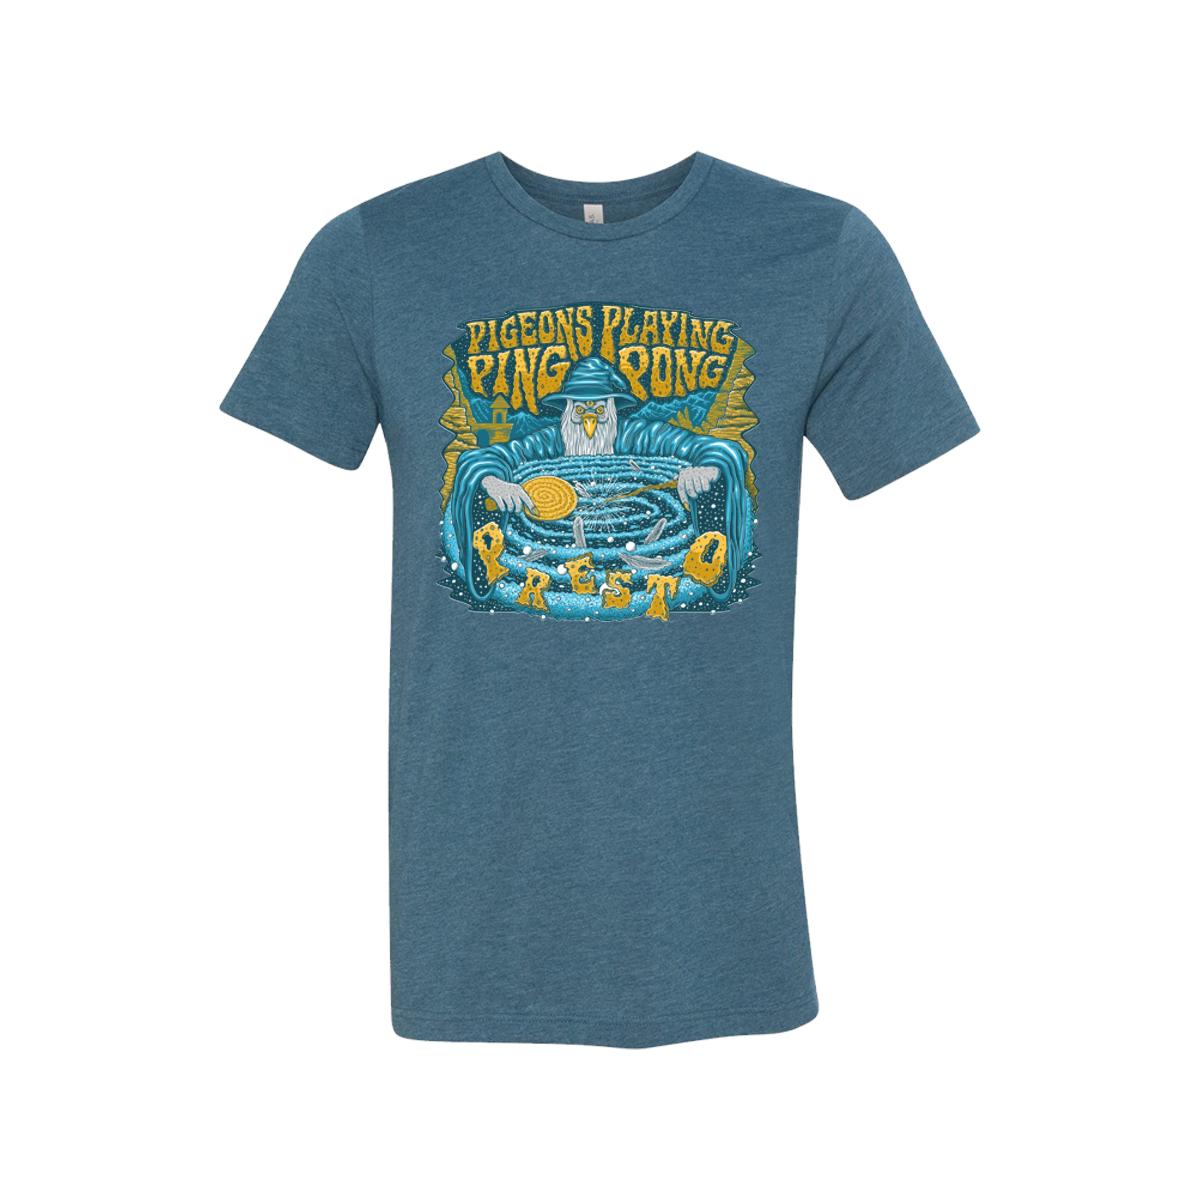 """Presto' T-shirt + Hoodie Bundle"